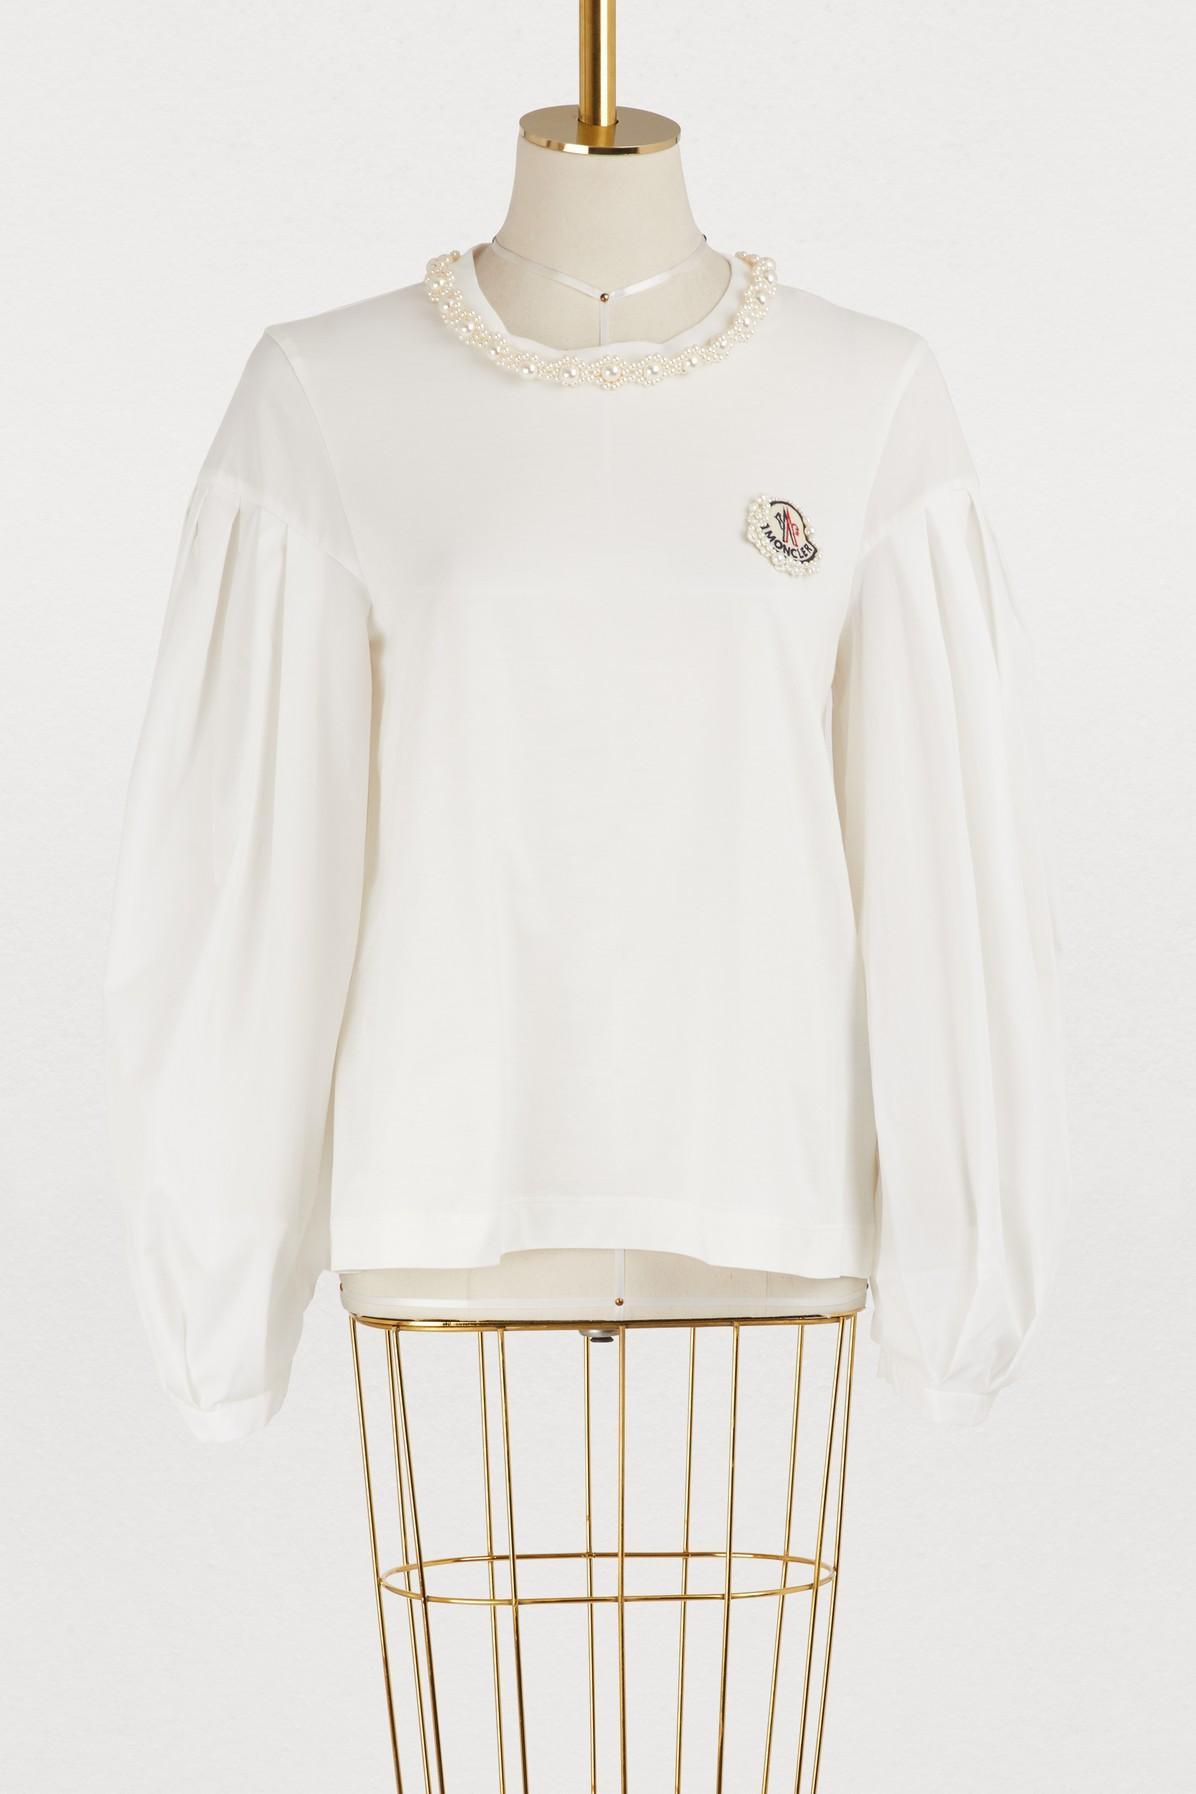 1d9d5bda0b03 Women s White 4 Moncler Simone Rocha Taffeta Sleeve Sweater